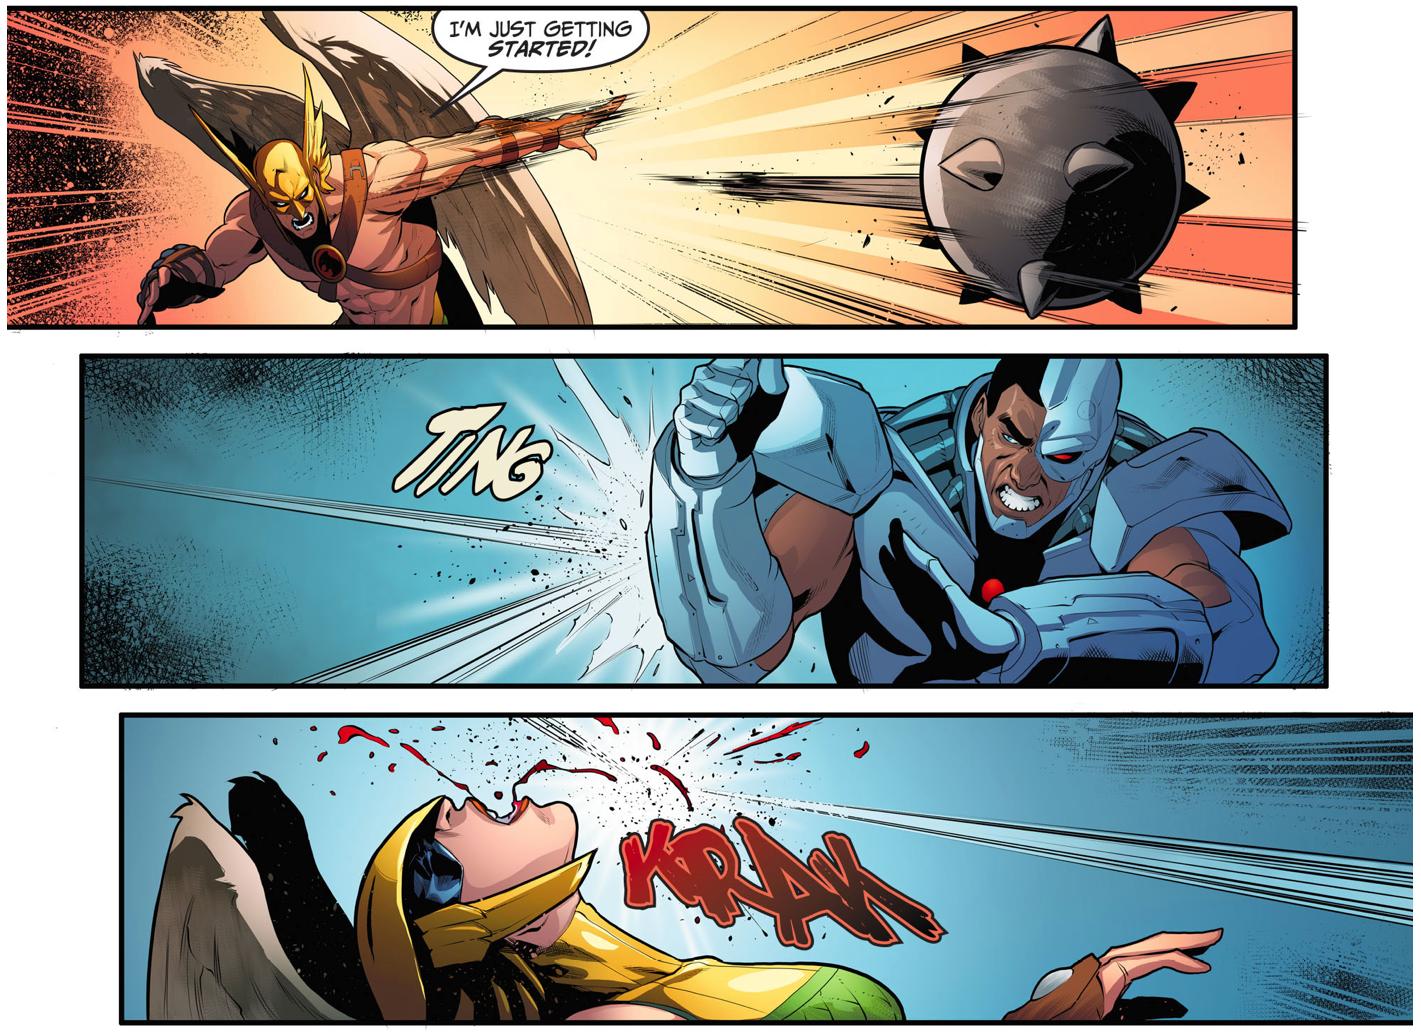 cyborg vs hawkman (injustice gods among us)